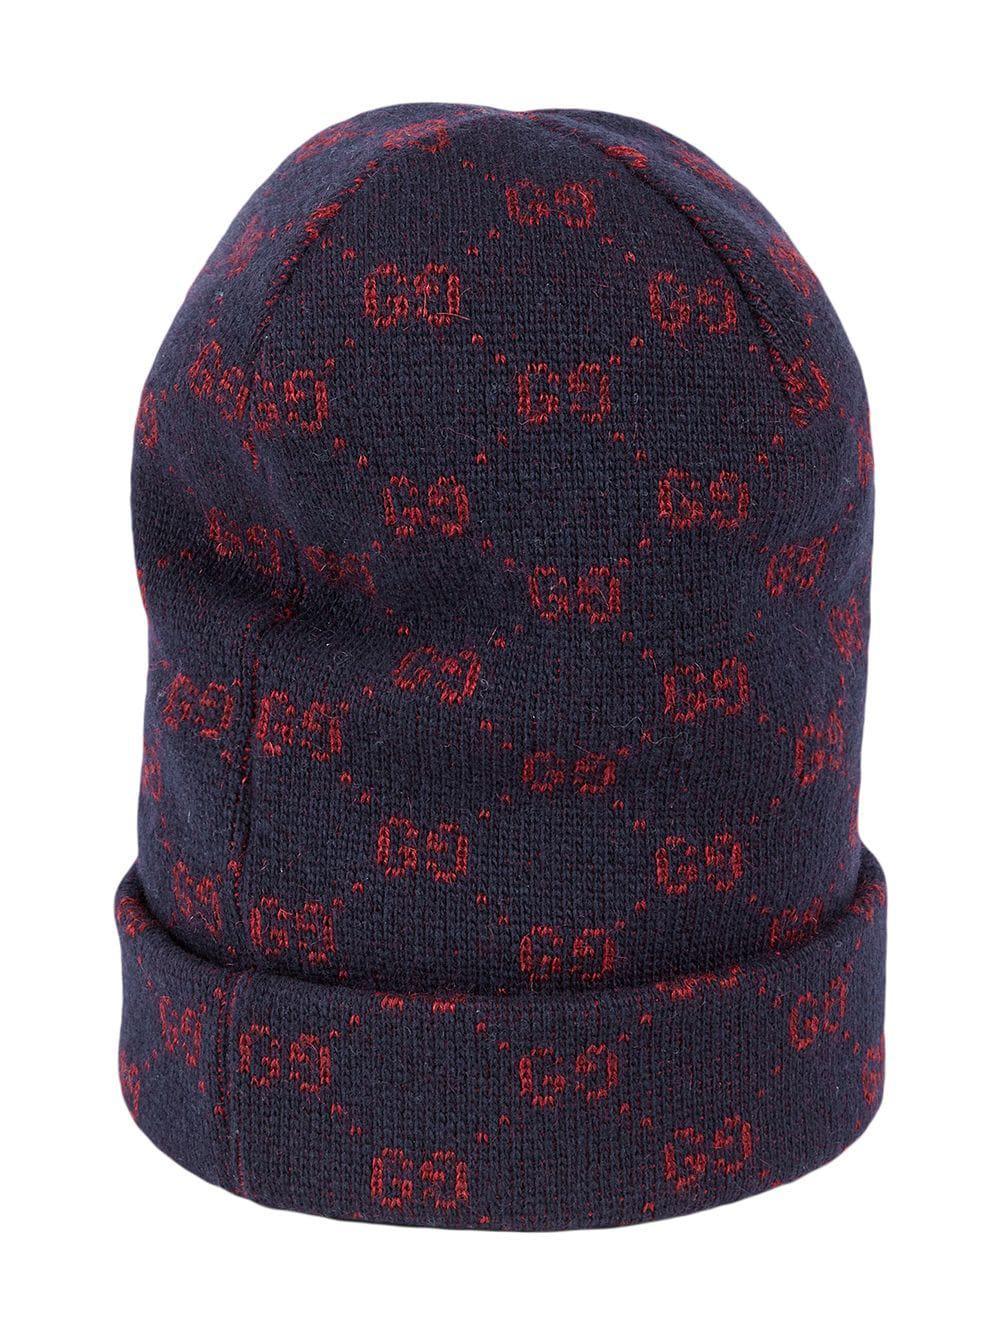 90221b957a15a Gucci - Blue GG Alpaca Wool Hat for Men - Lyst. View fullscreen